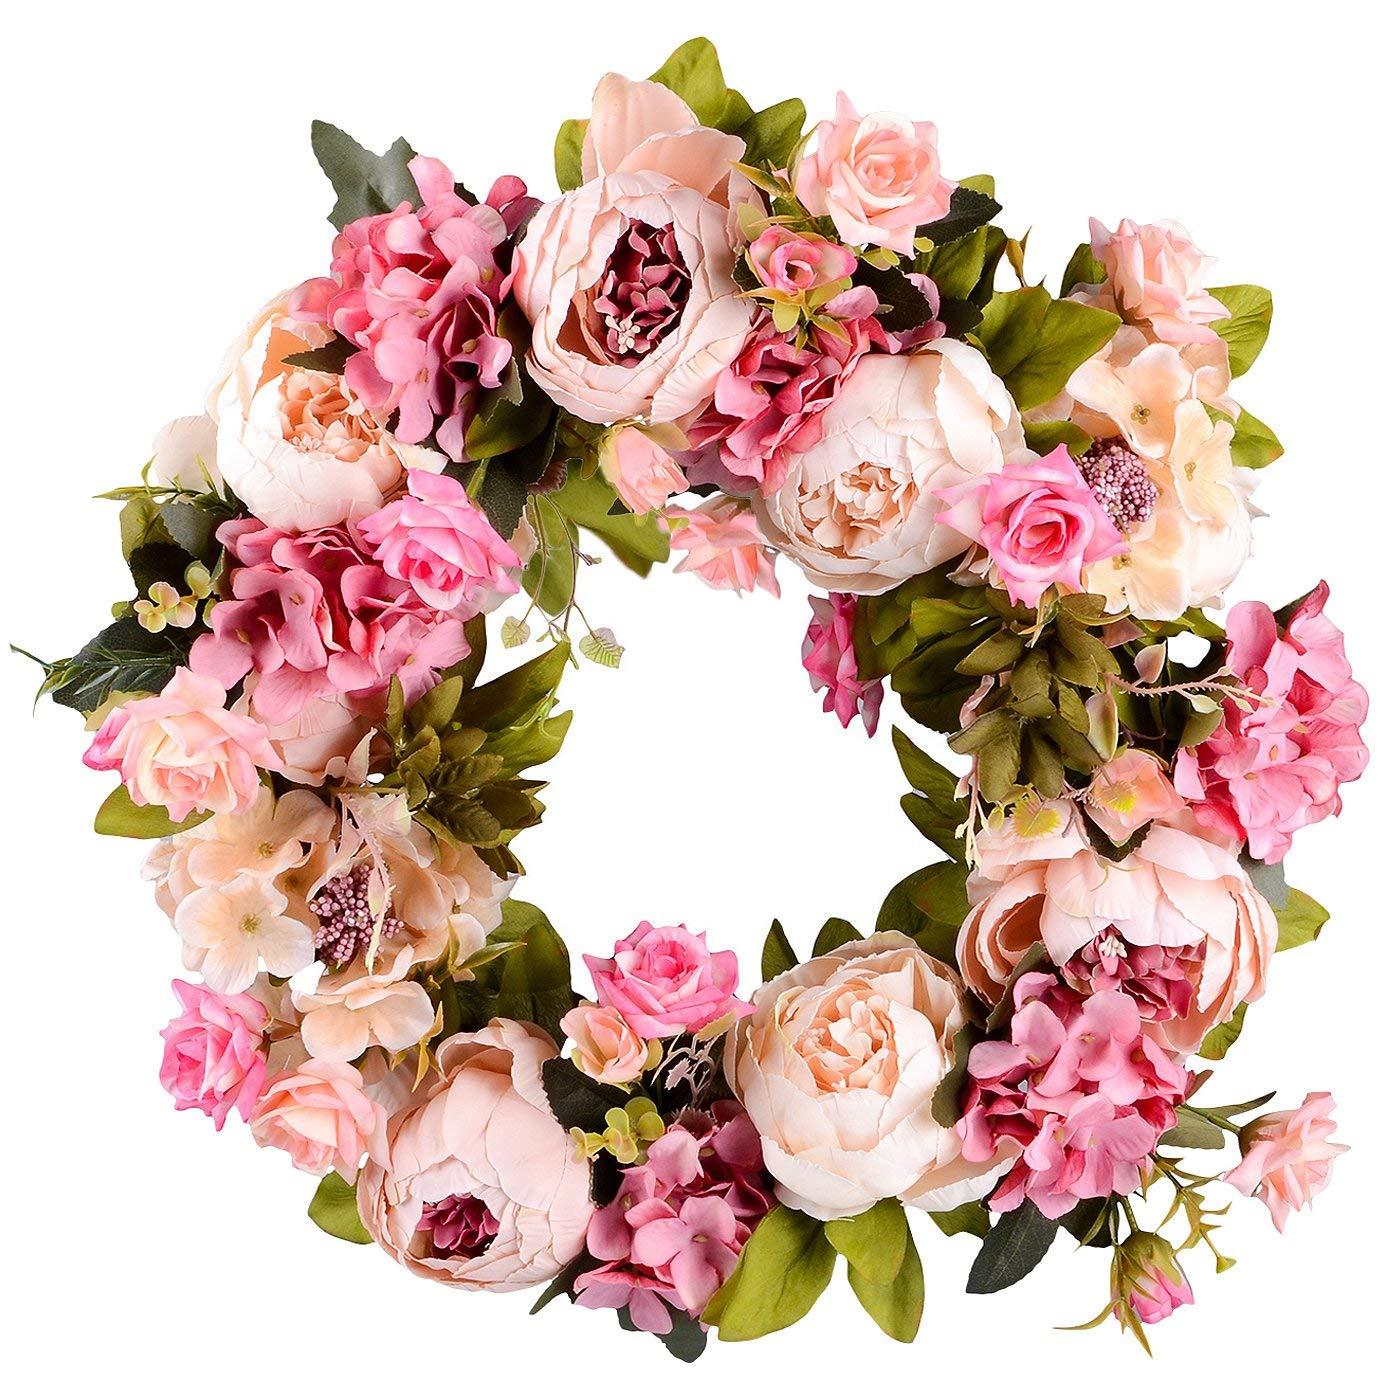 Flower Wreaths For Weddings: Artificial Flower Wreath Peony Wreath 16inch Spring Round